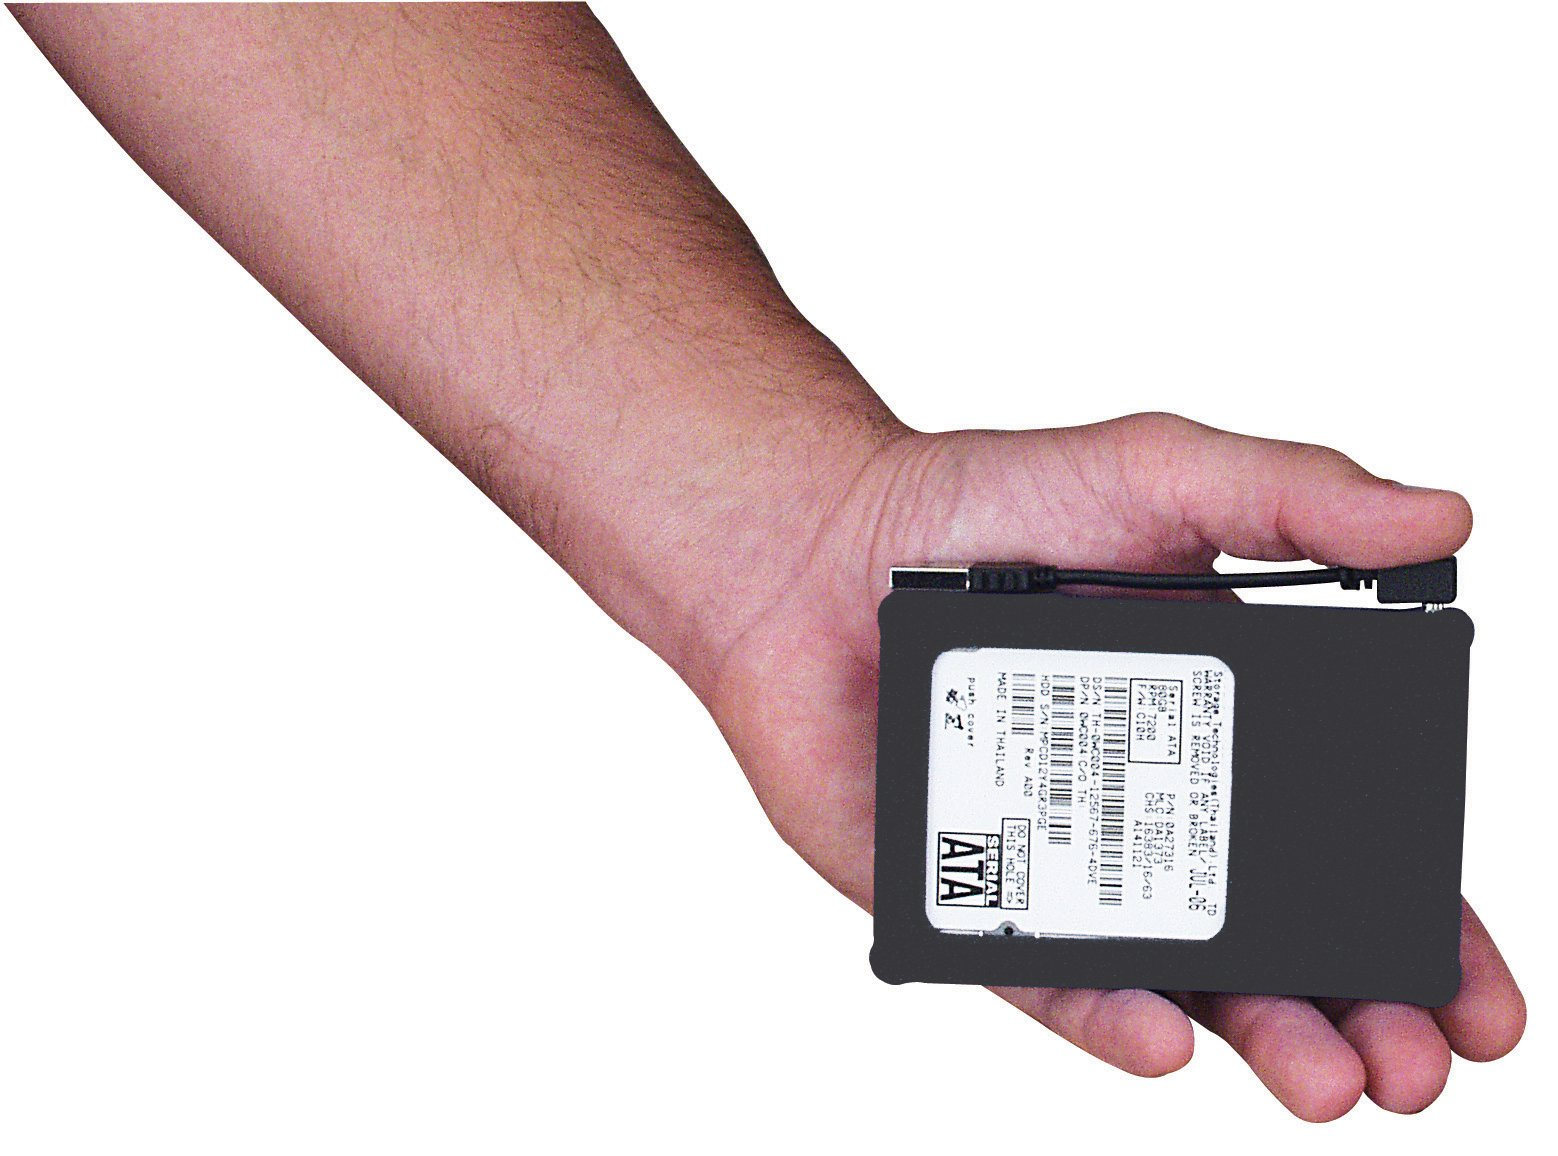 MANHATTAN Hi-Speed USB 2.0 2.5-Inch SATA Drive Enclosure Black, Silicone (130103)